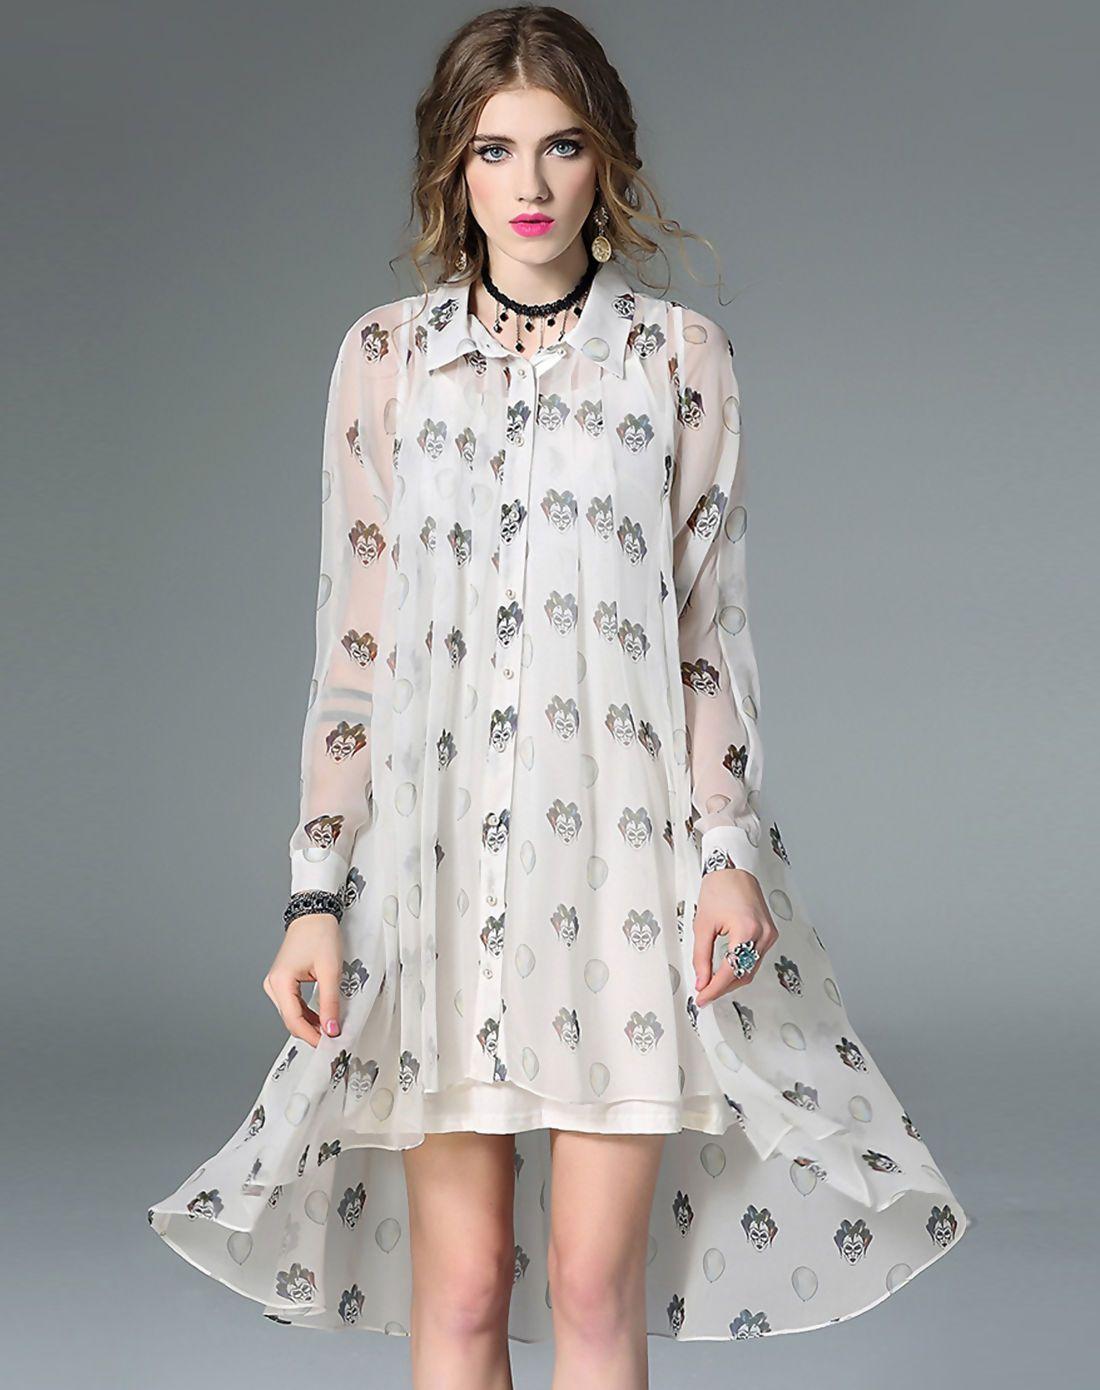 #AdoreWe #VIPme Swing Dresses - mojaser White Silk Printed High Low Swing Dress - AdoreWe.com